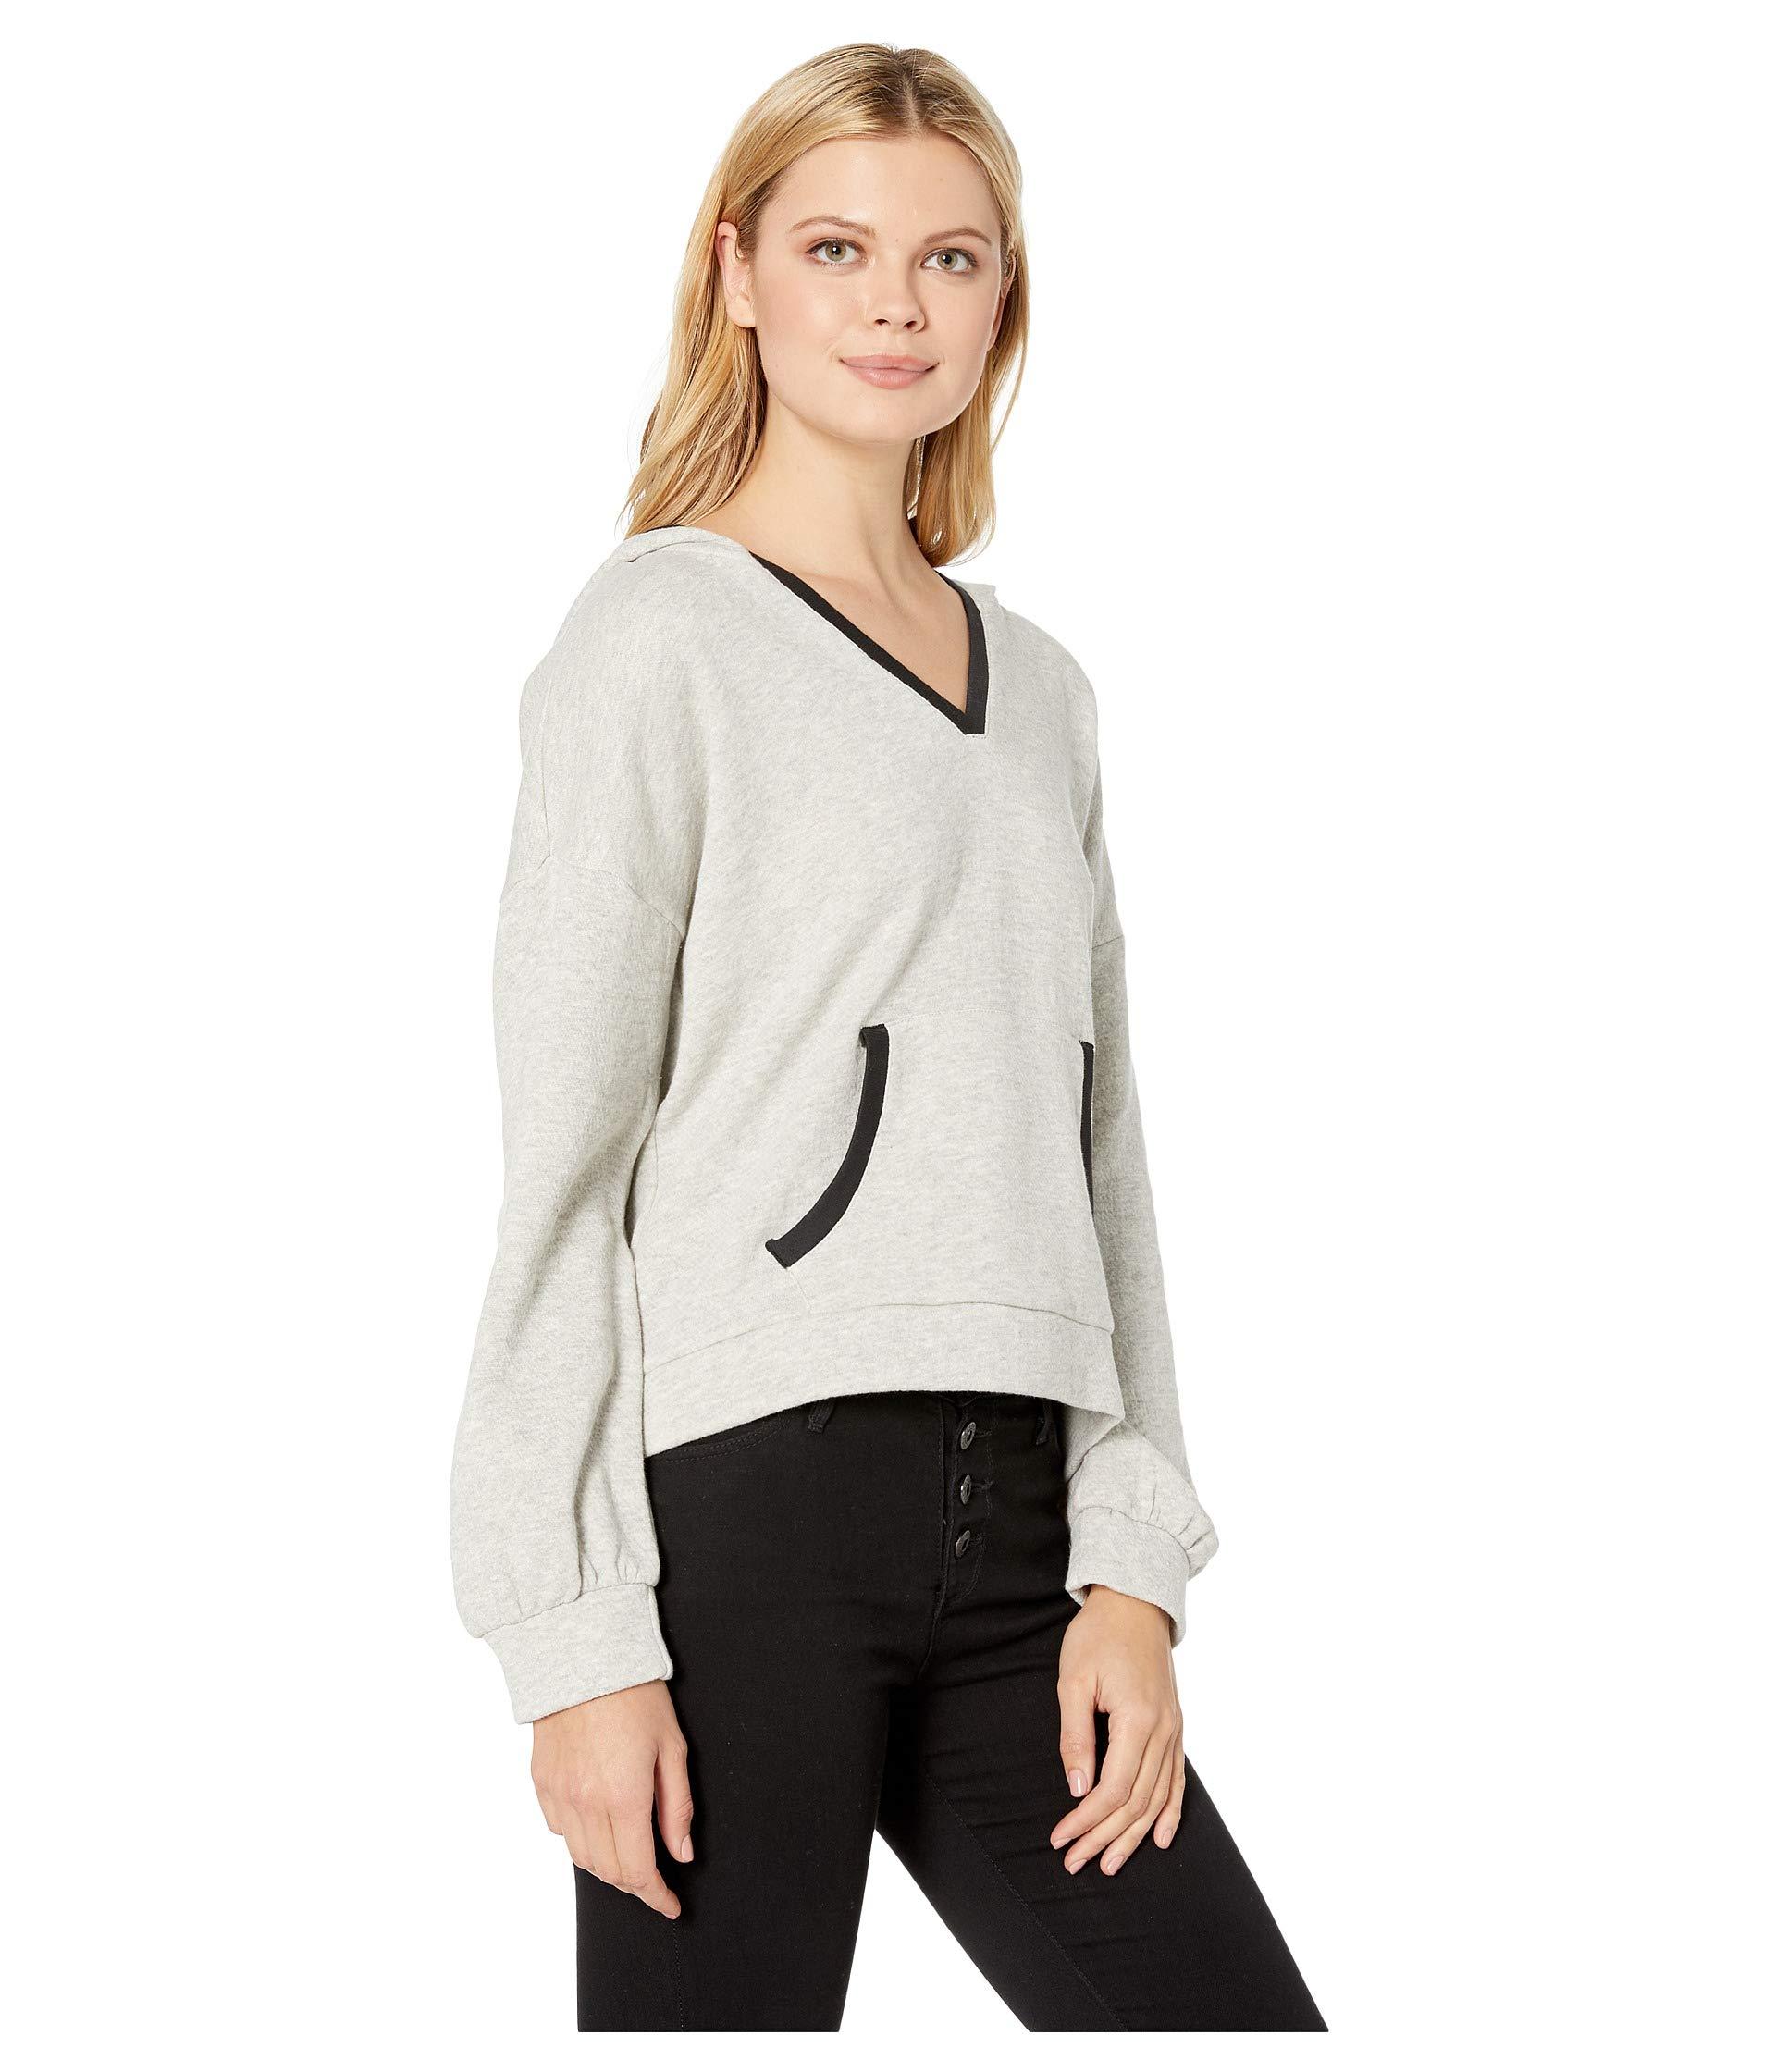 Lucky Multi Sweatshirt Grey Hooded Brand Contrast Trim r1qr08